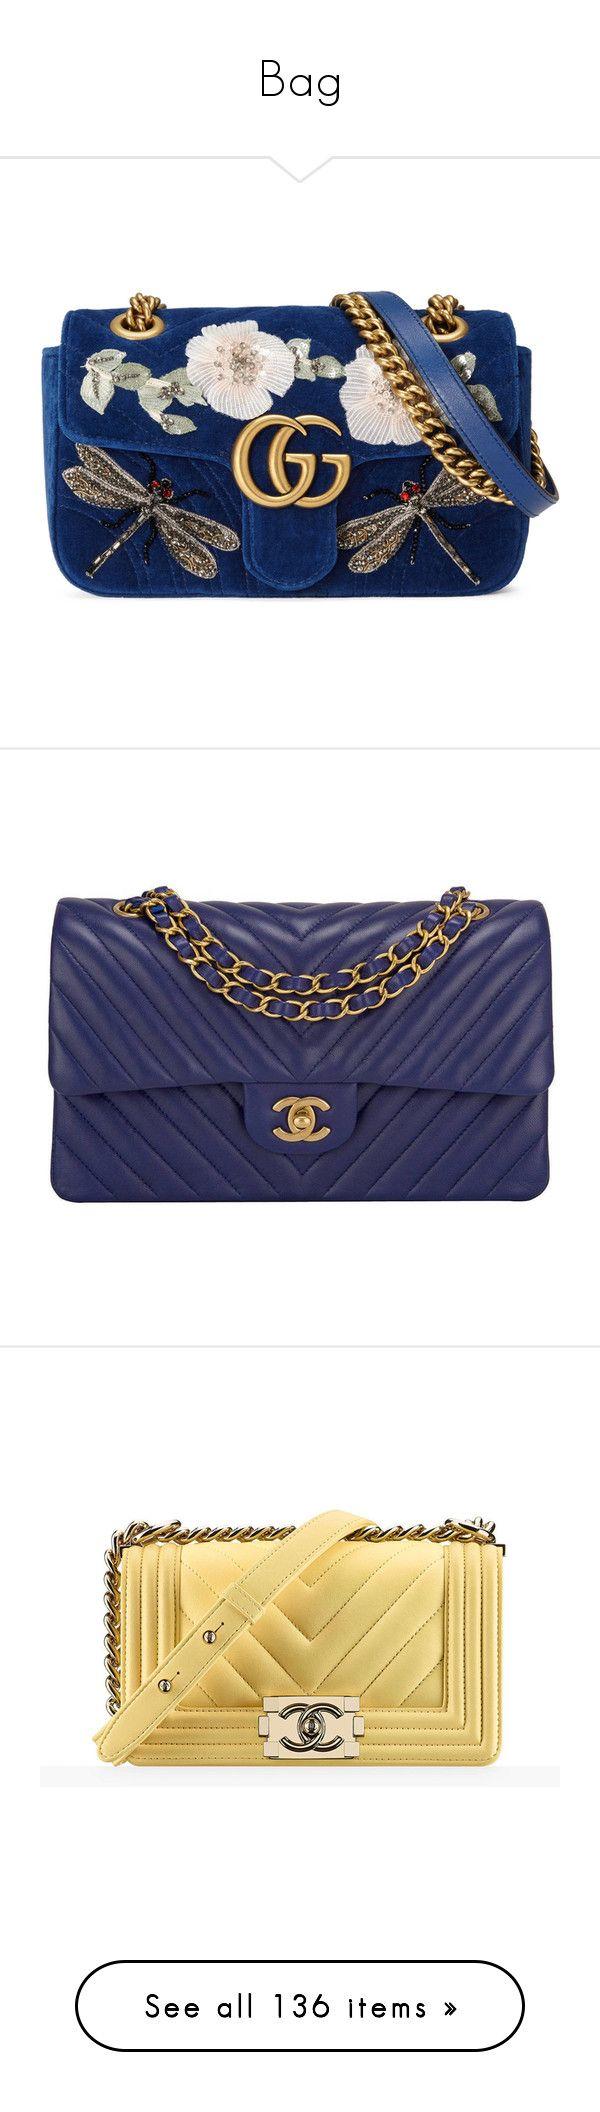 """Bag"" by xxsasaxx ❤ liked on Polyvore featuring bags, handbags, gucci, purses, bolsas, cobalt blue, shoulder bags, women, handbag purse and man bag"